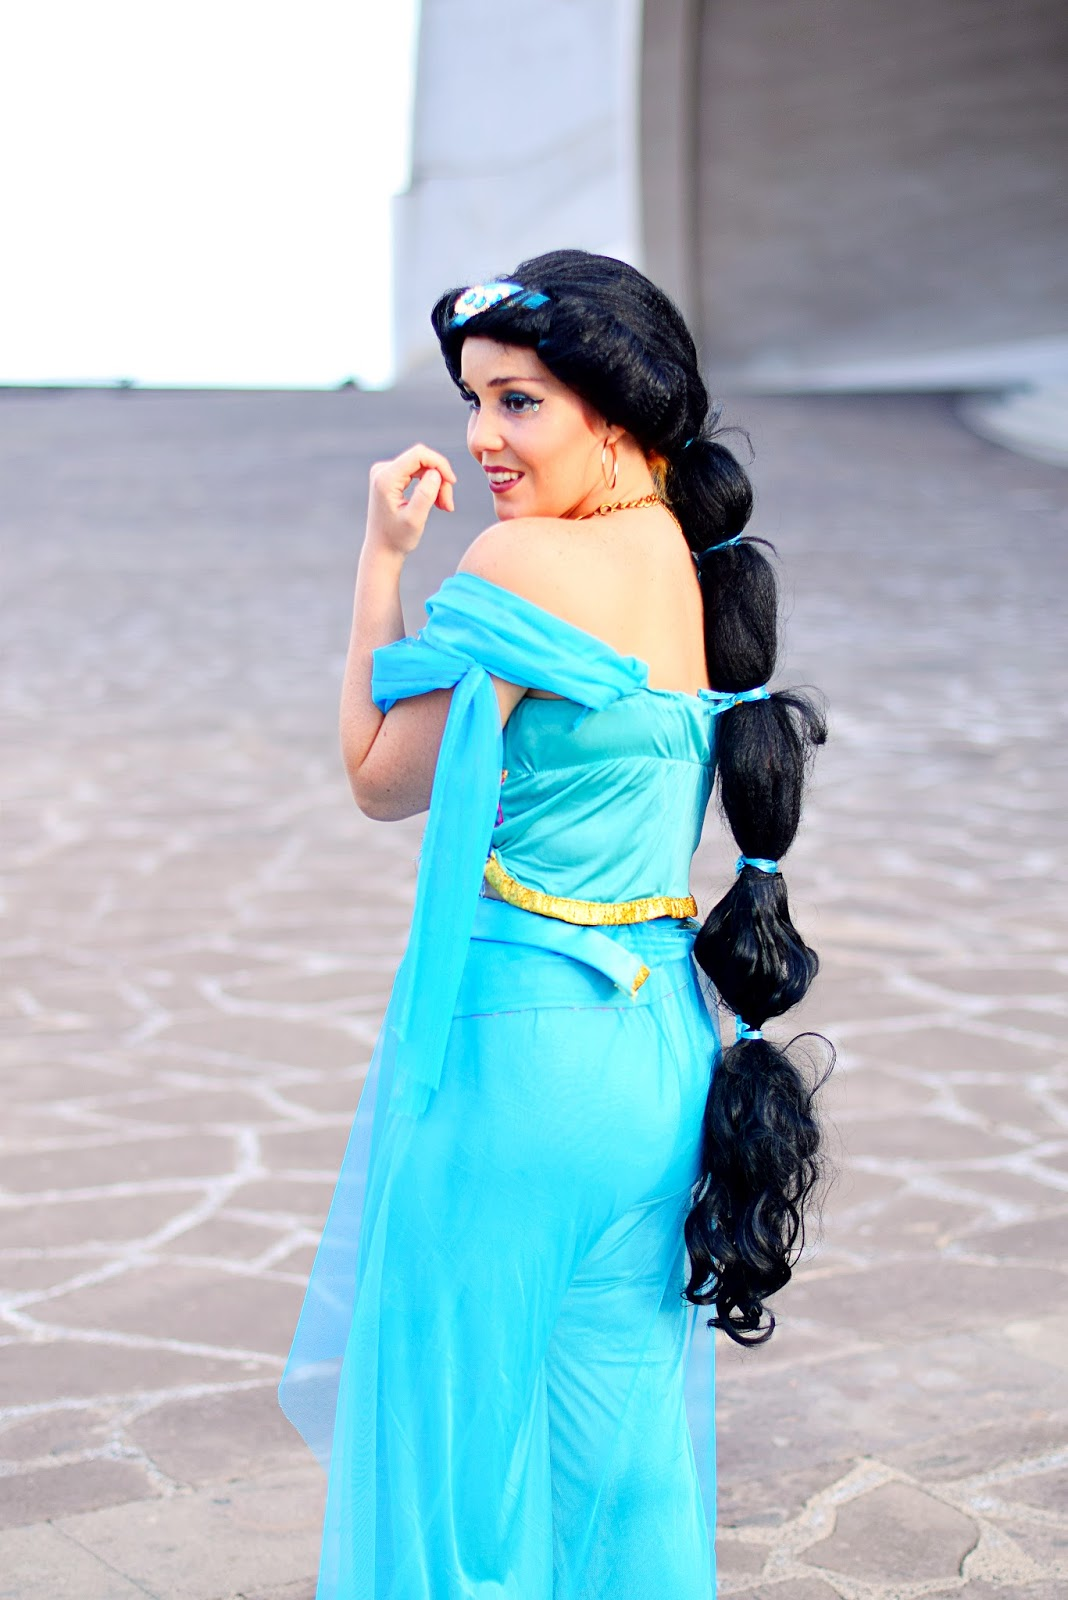 nery hdez, carnaval de tenerife, jasmine costume, jasmine cosplay, disfraz de la princesa jasmin,